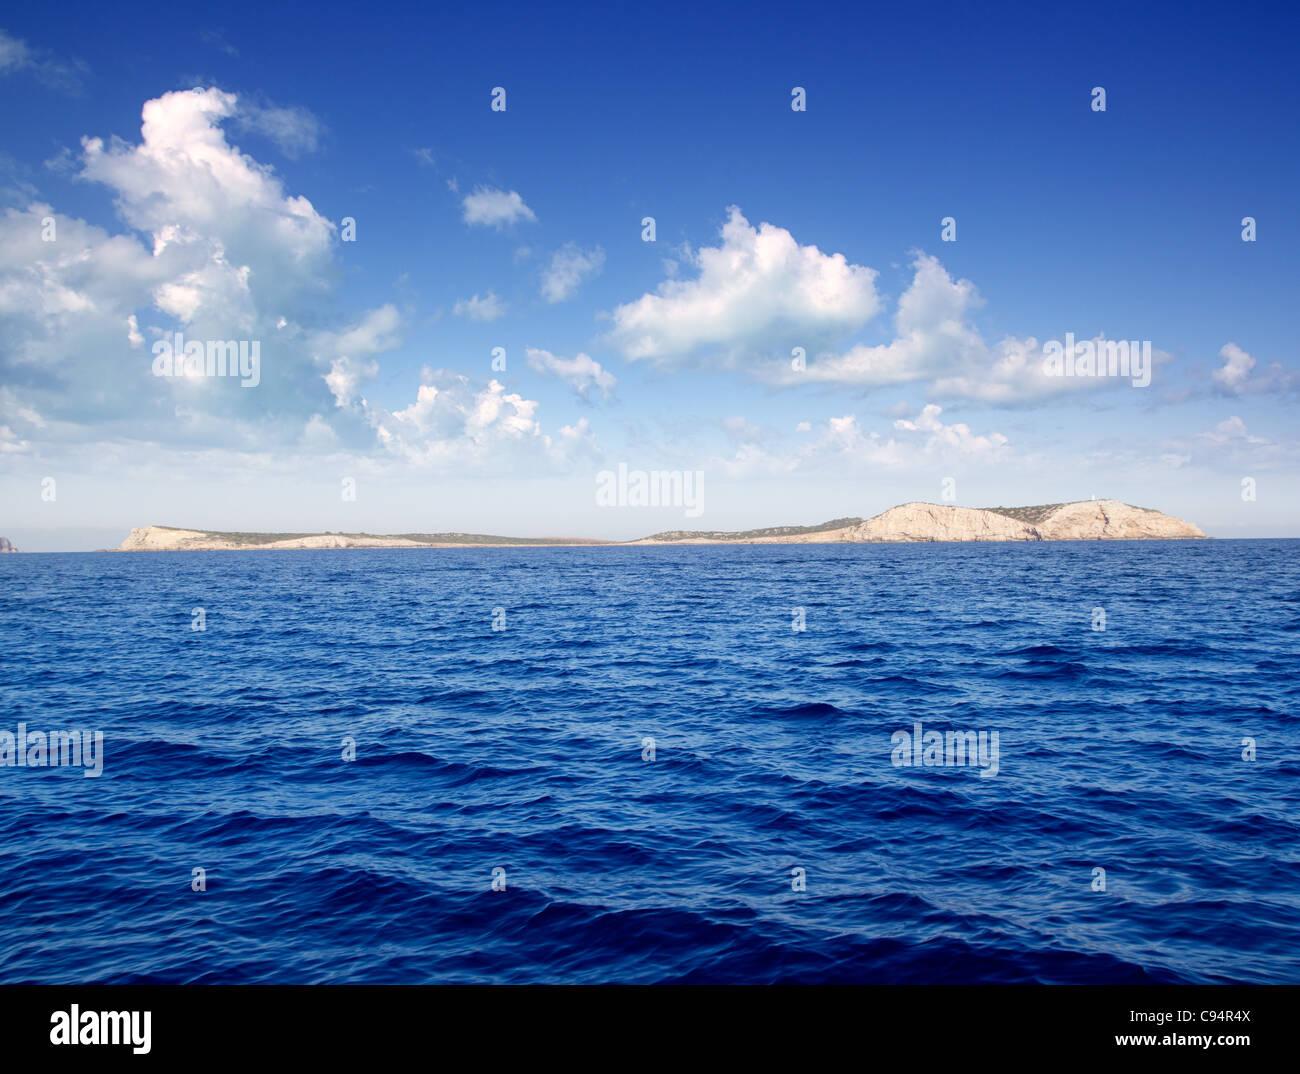 Ibiza Conillera and Bosque islands in a blue day in Mediterranean - Stock Image